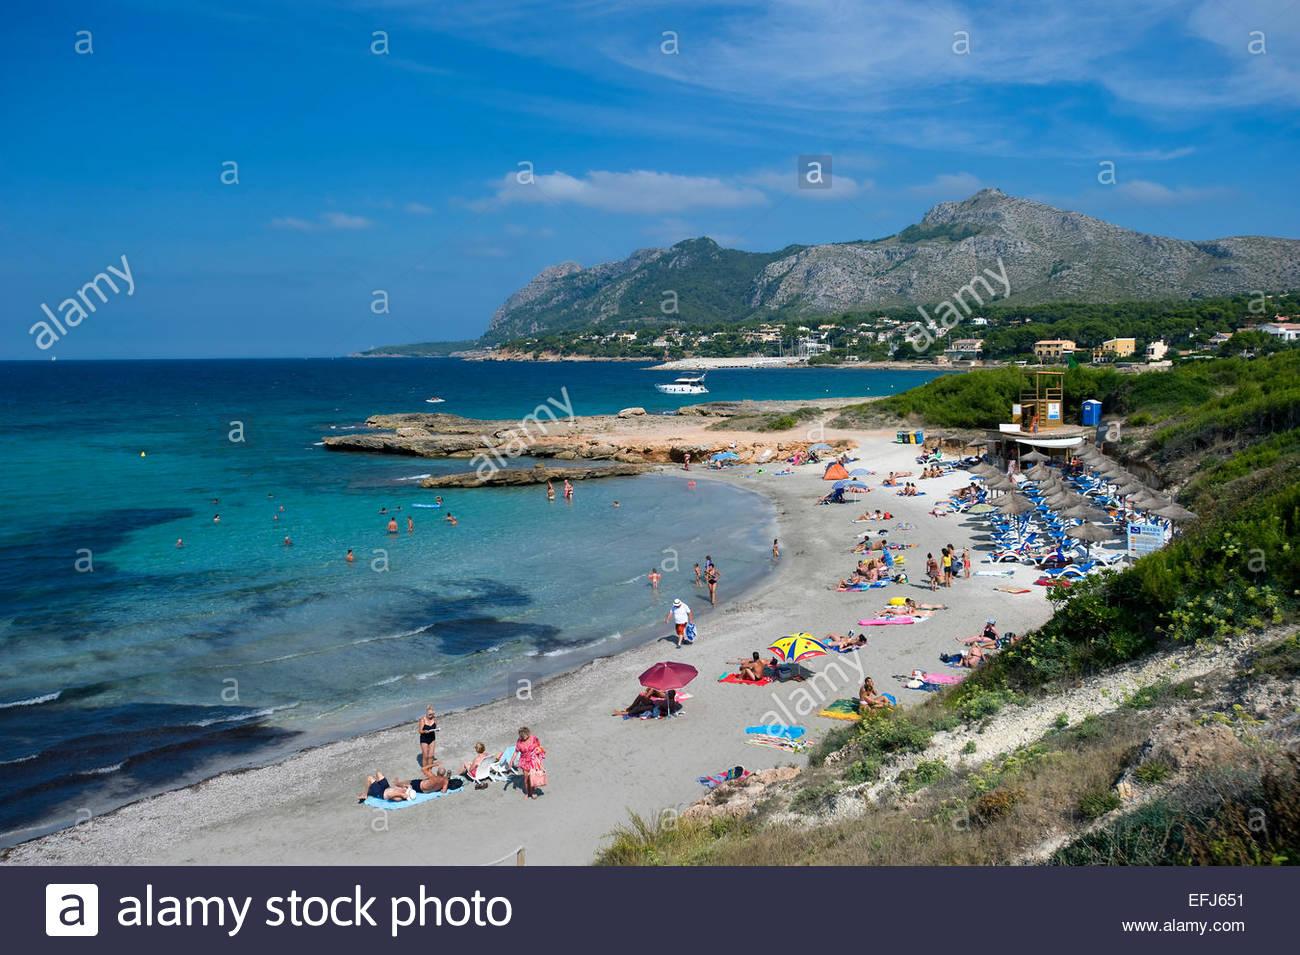 Playa Sant Joan, Bonaire, Mallorca, Balearics, Spain - Stock Image